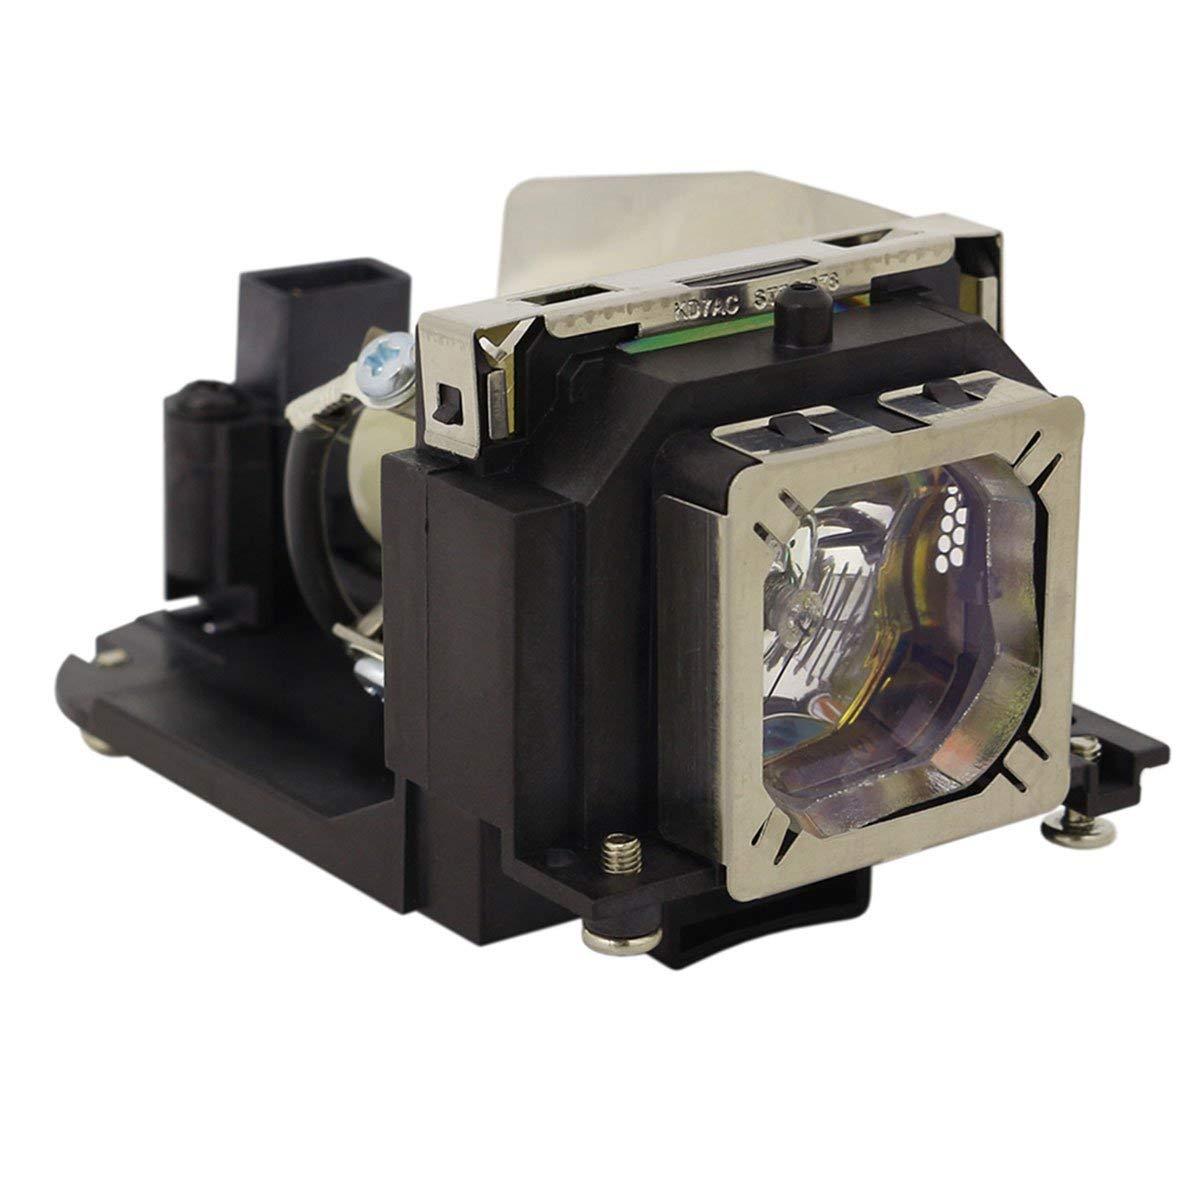 Supermait POA-LMP129 ランプ電球 SANYO PLC-XW65 / PLC-XW65K / PLC-XW1100C / PLC-XW6605C / PLC-XW6685C 交換用ランプバルブ ハウジング付き   B07N3V5YG2